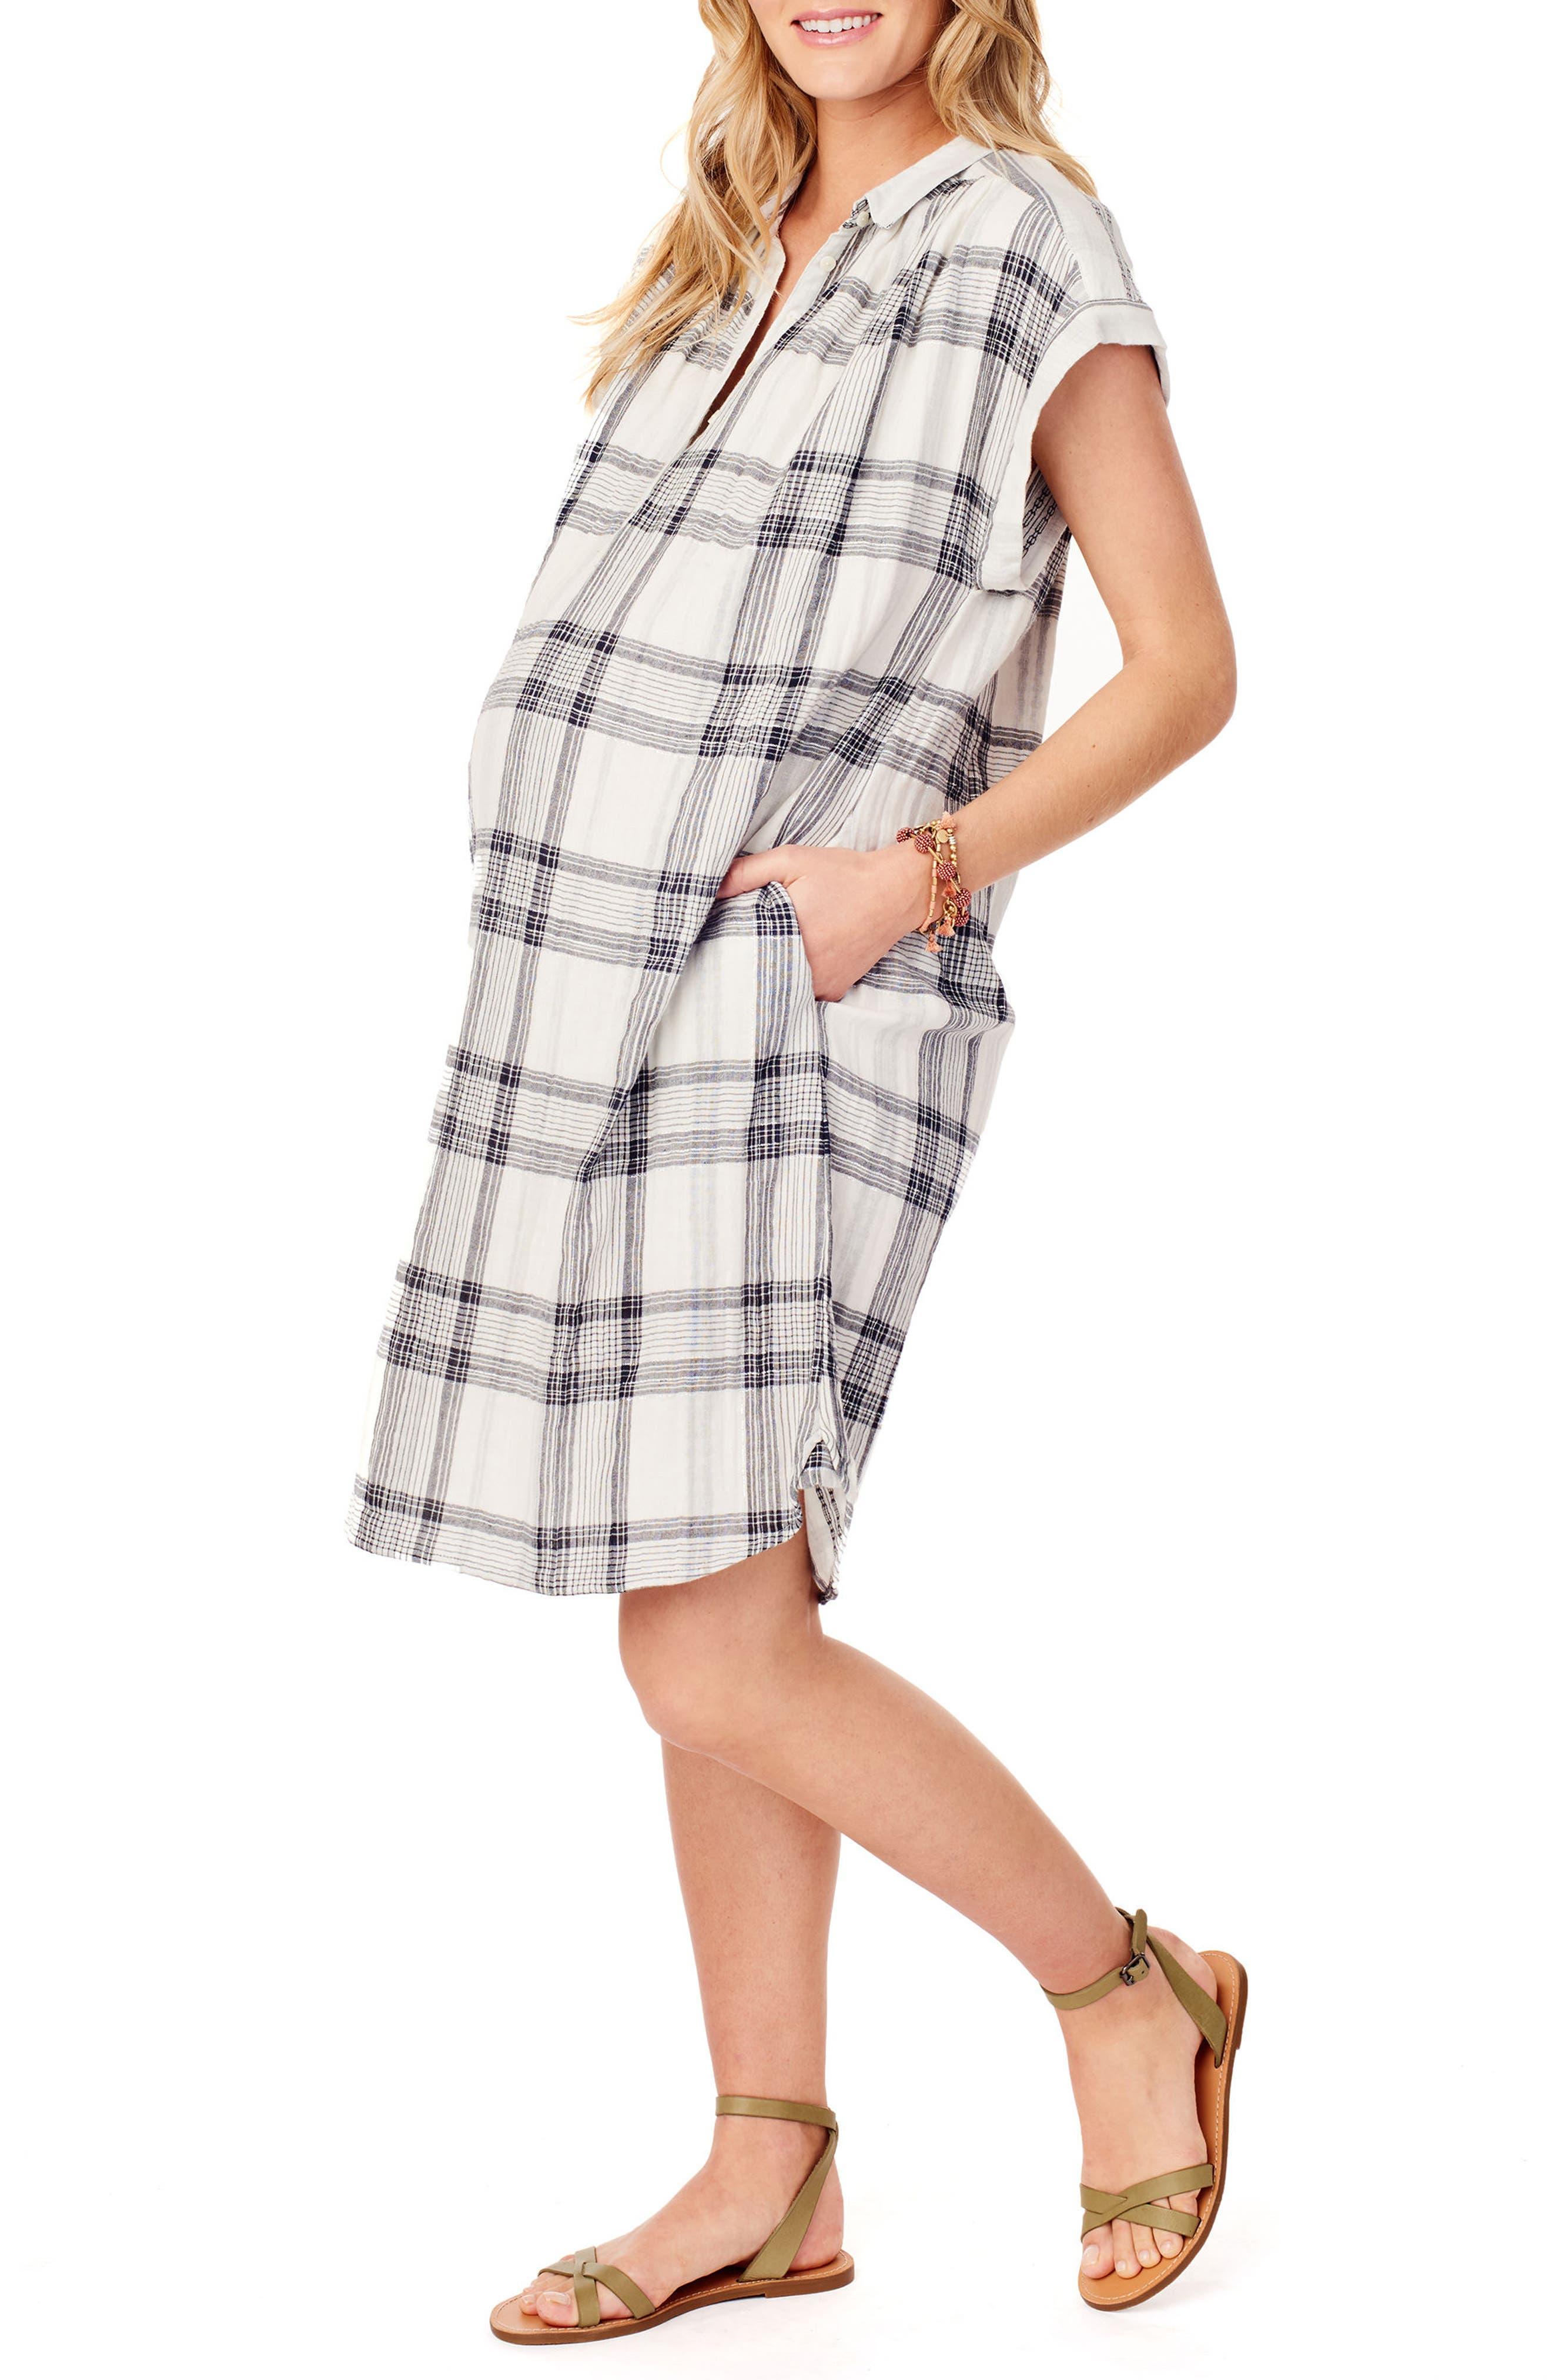 Ingrid & Isabel Maternity Shift Dress,                             Alternate thumbnail 3, color,                             WHITE/ BLACK LUREX PLAID